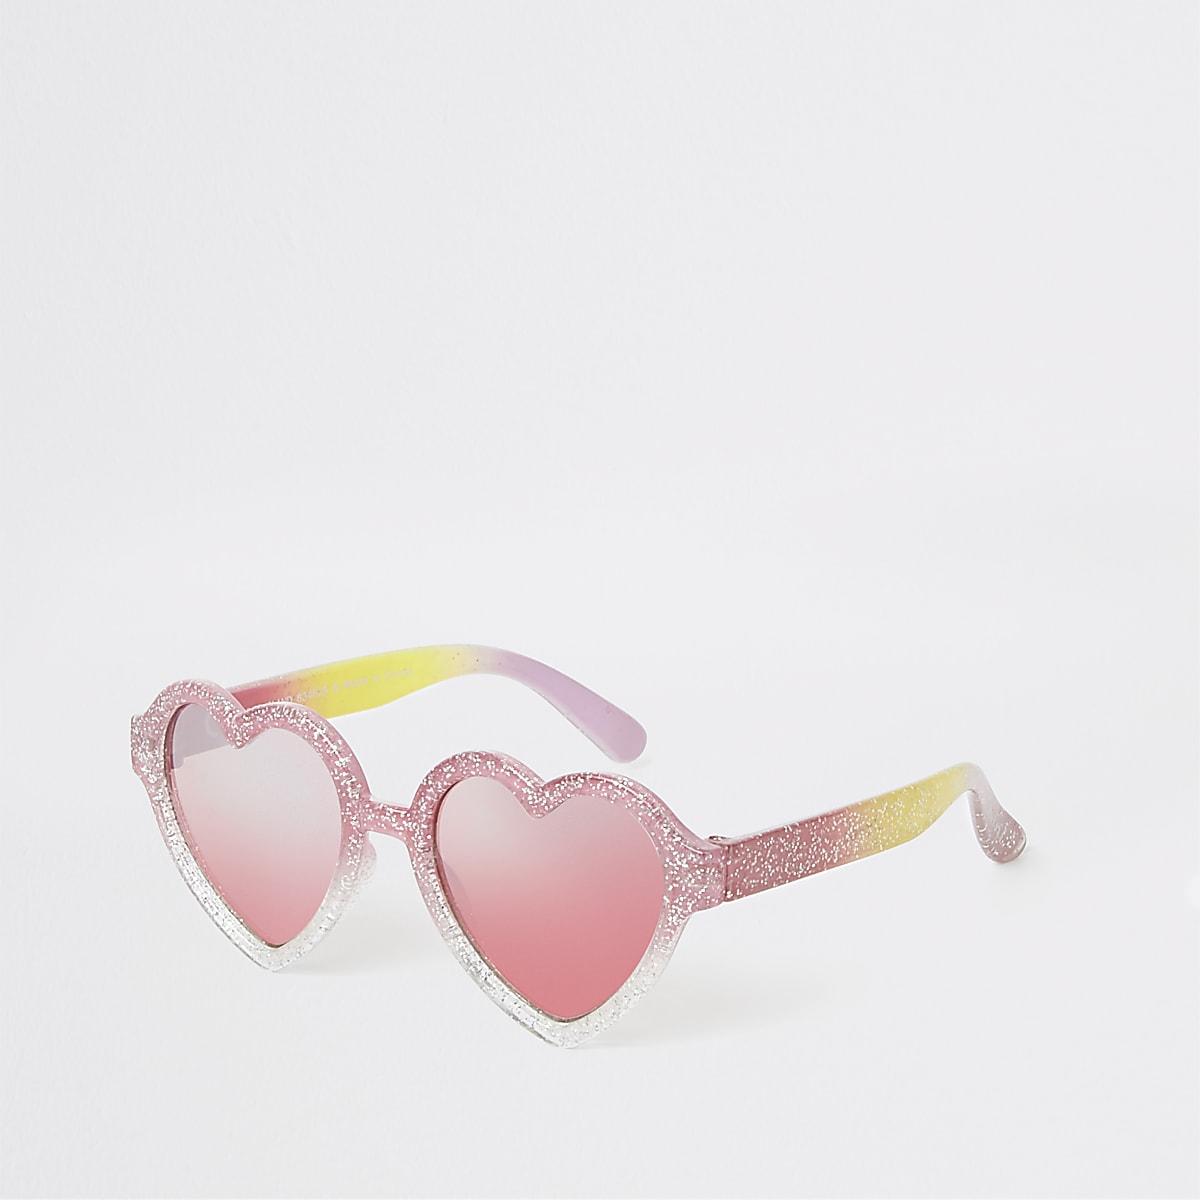 b25b2a58bf39 Mini girls pink glitter heart sunglasses - Baby Girls Accessories ...